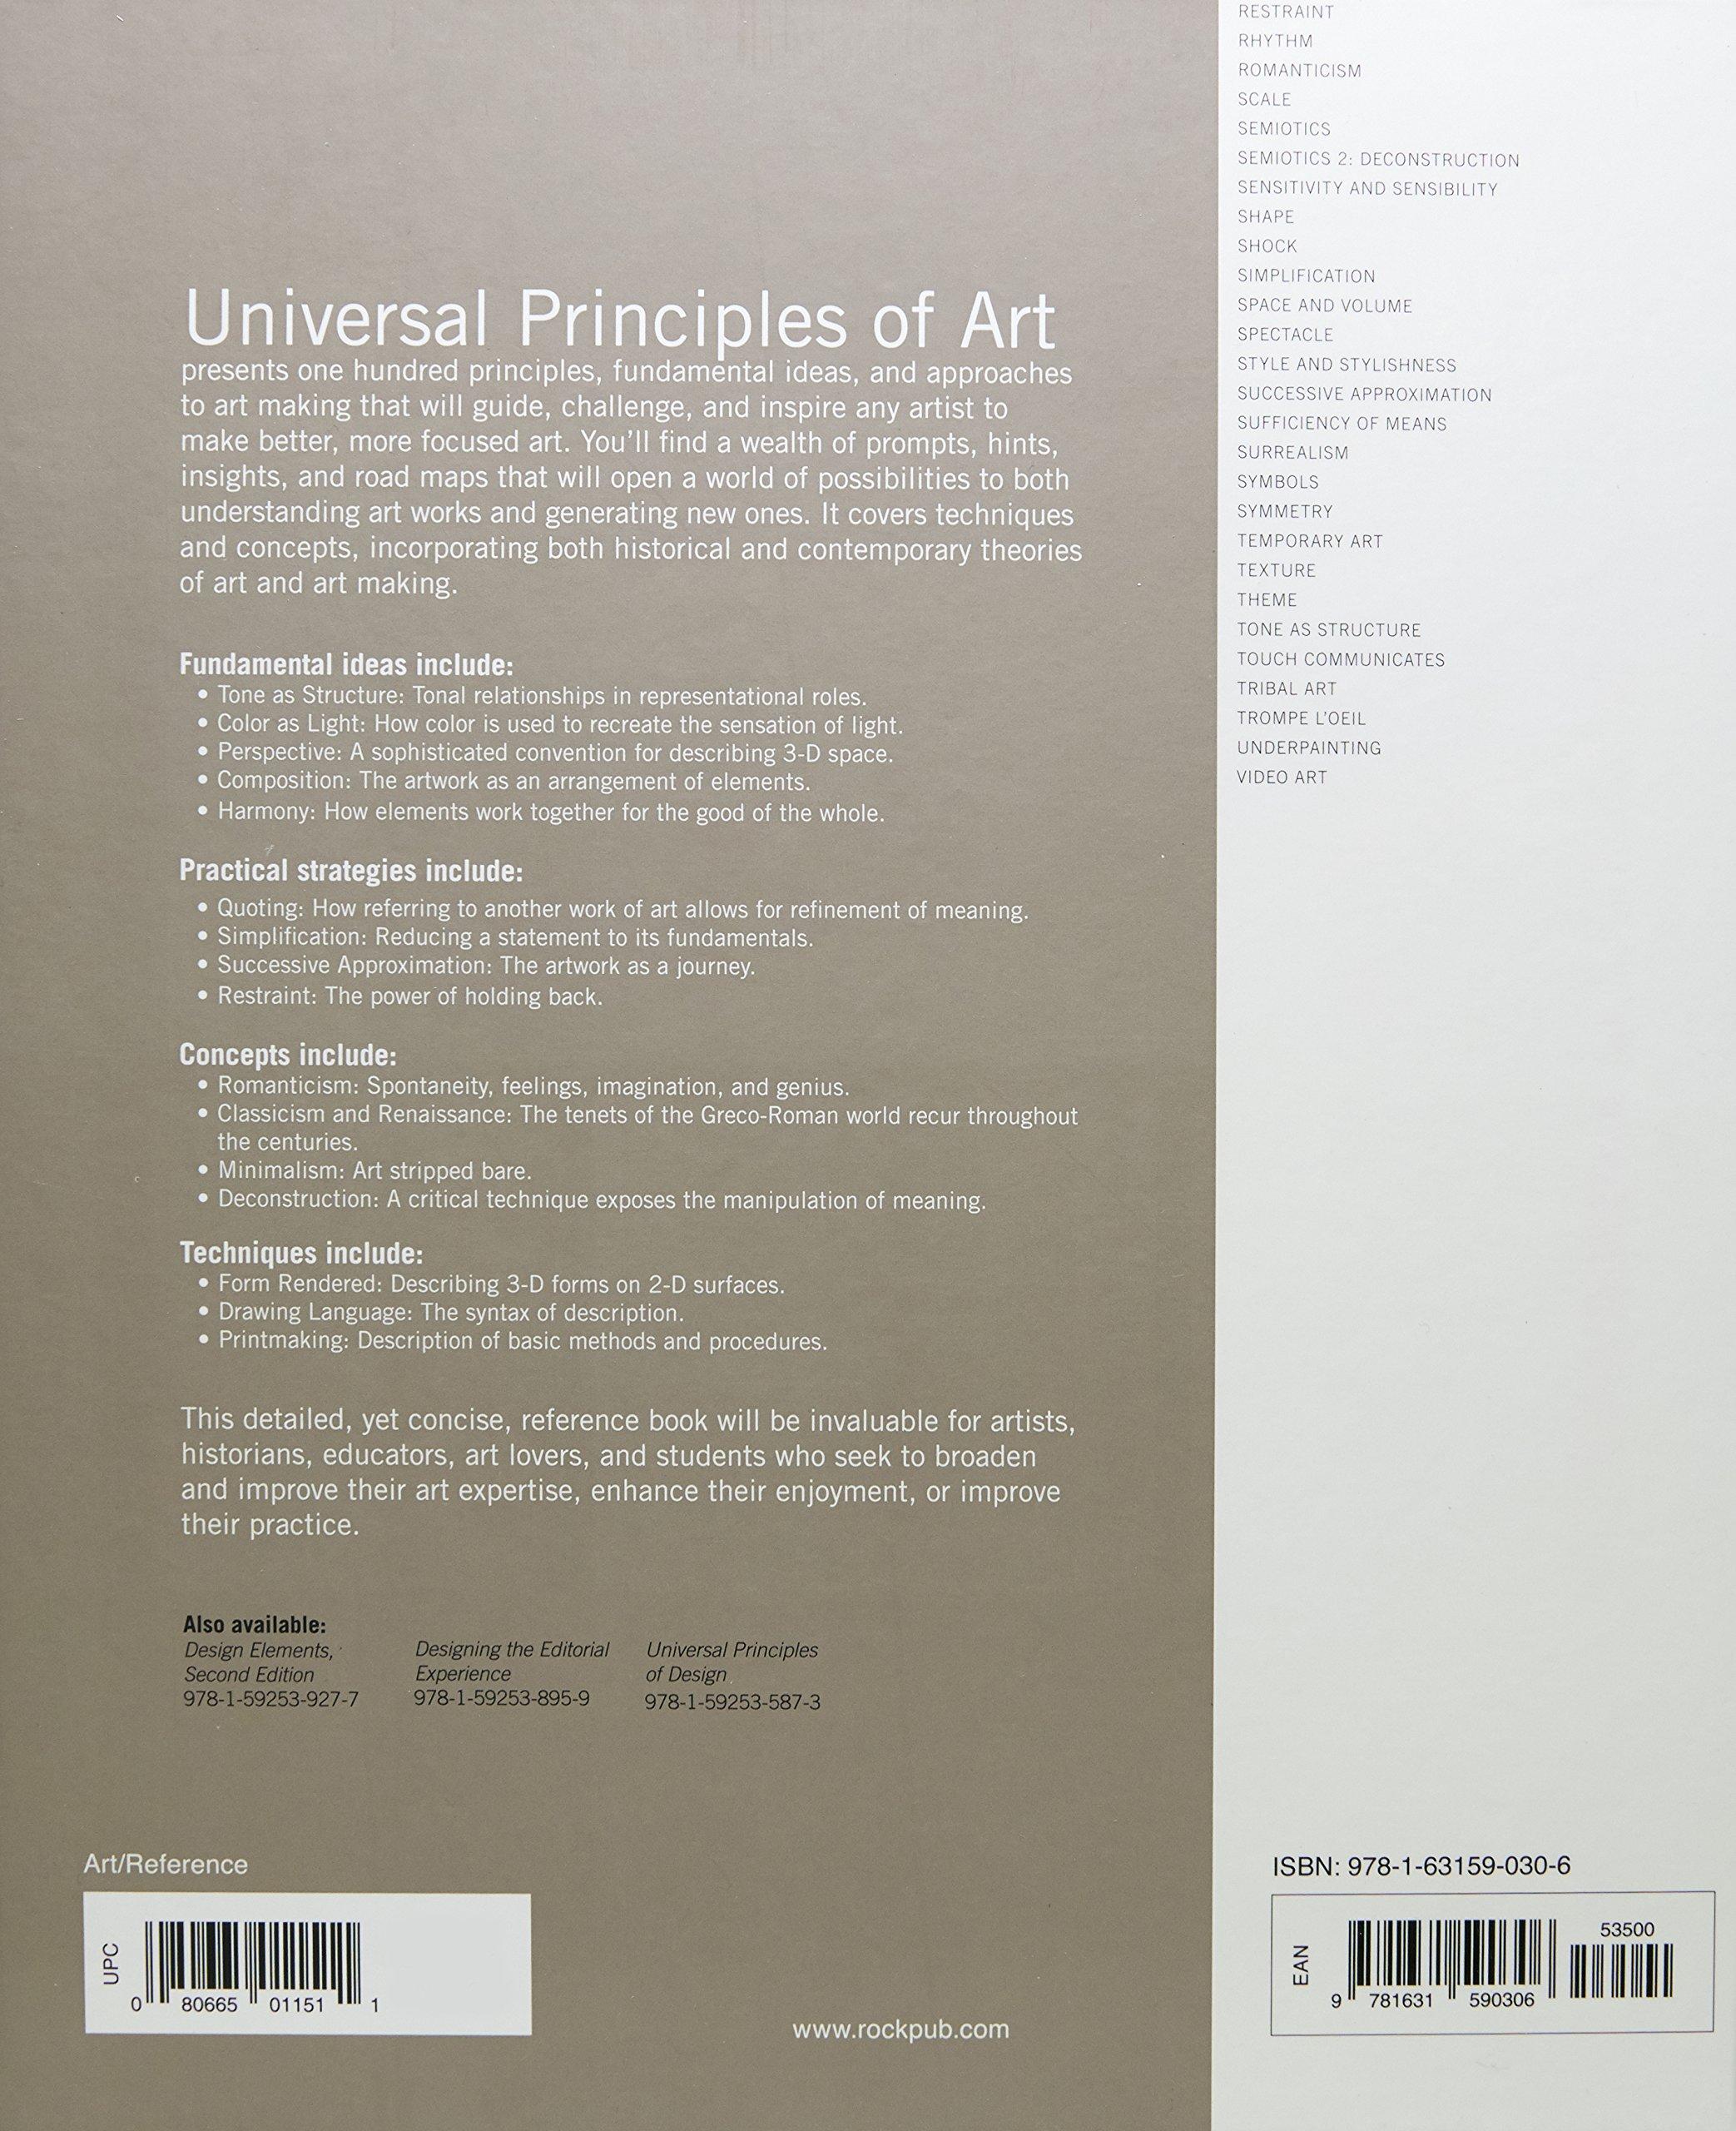 universal principles of art 100 key concepts for understanding